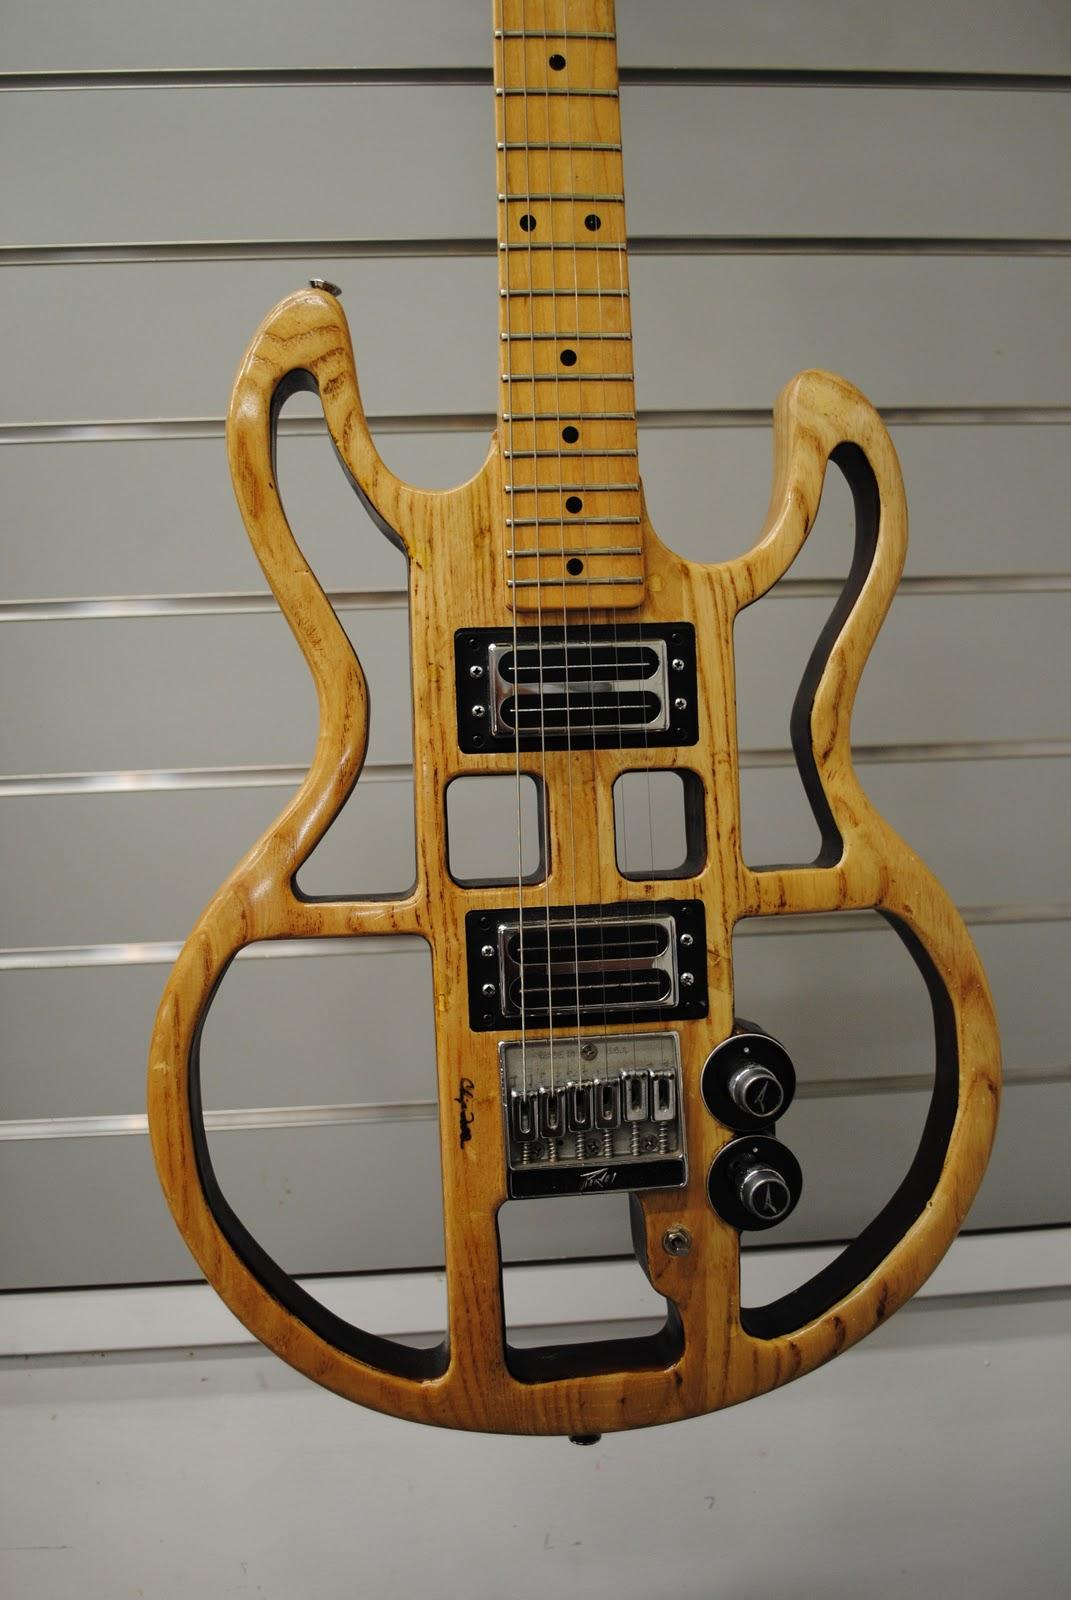 Peavey T 60 Wiring Diagram Seymour Duncan Ibanez Guitar Get Free Image